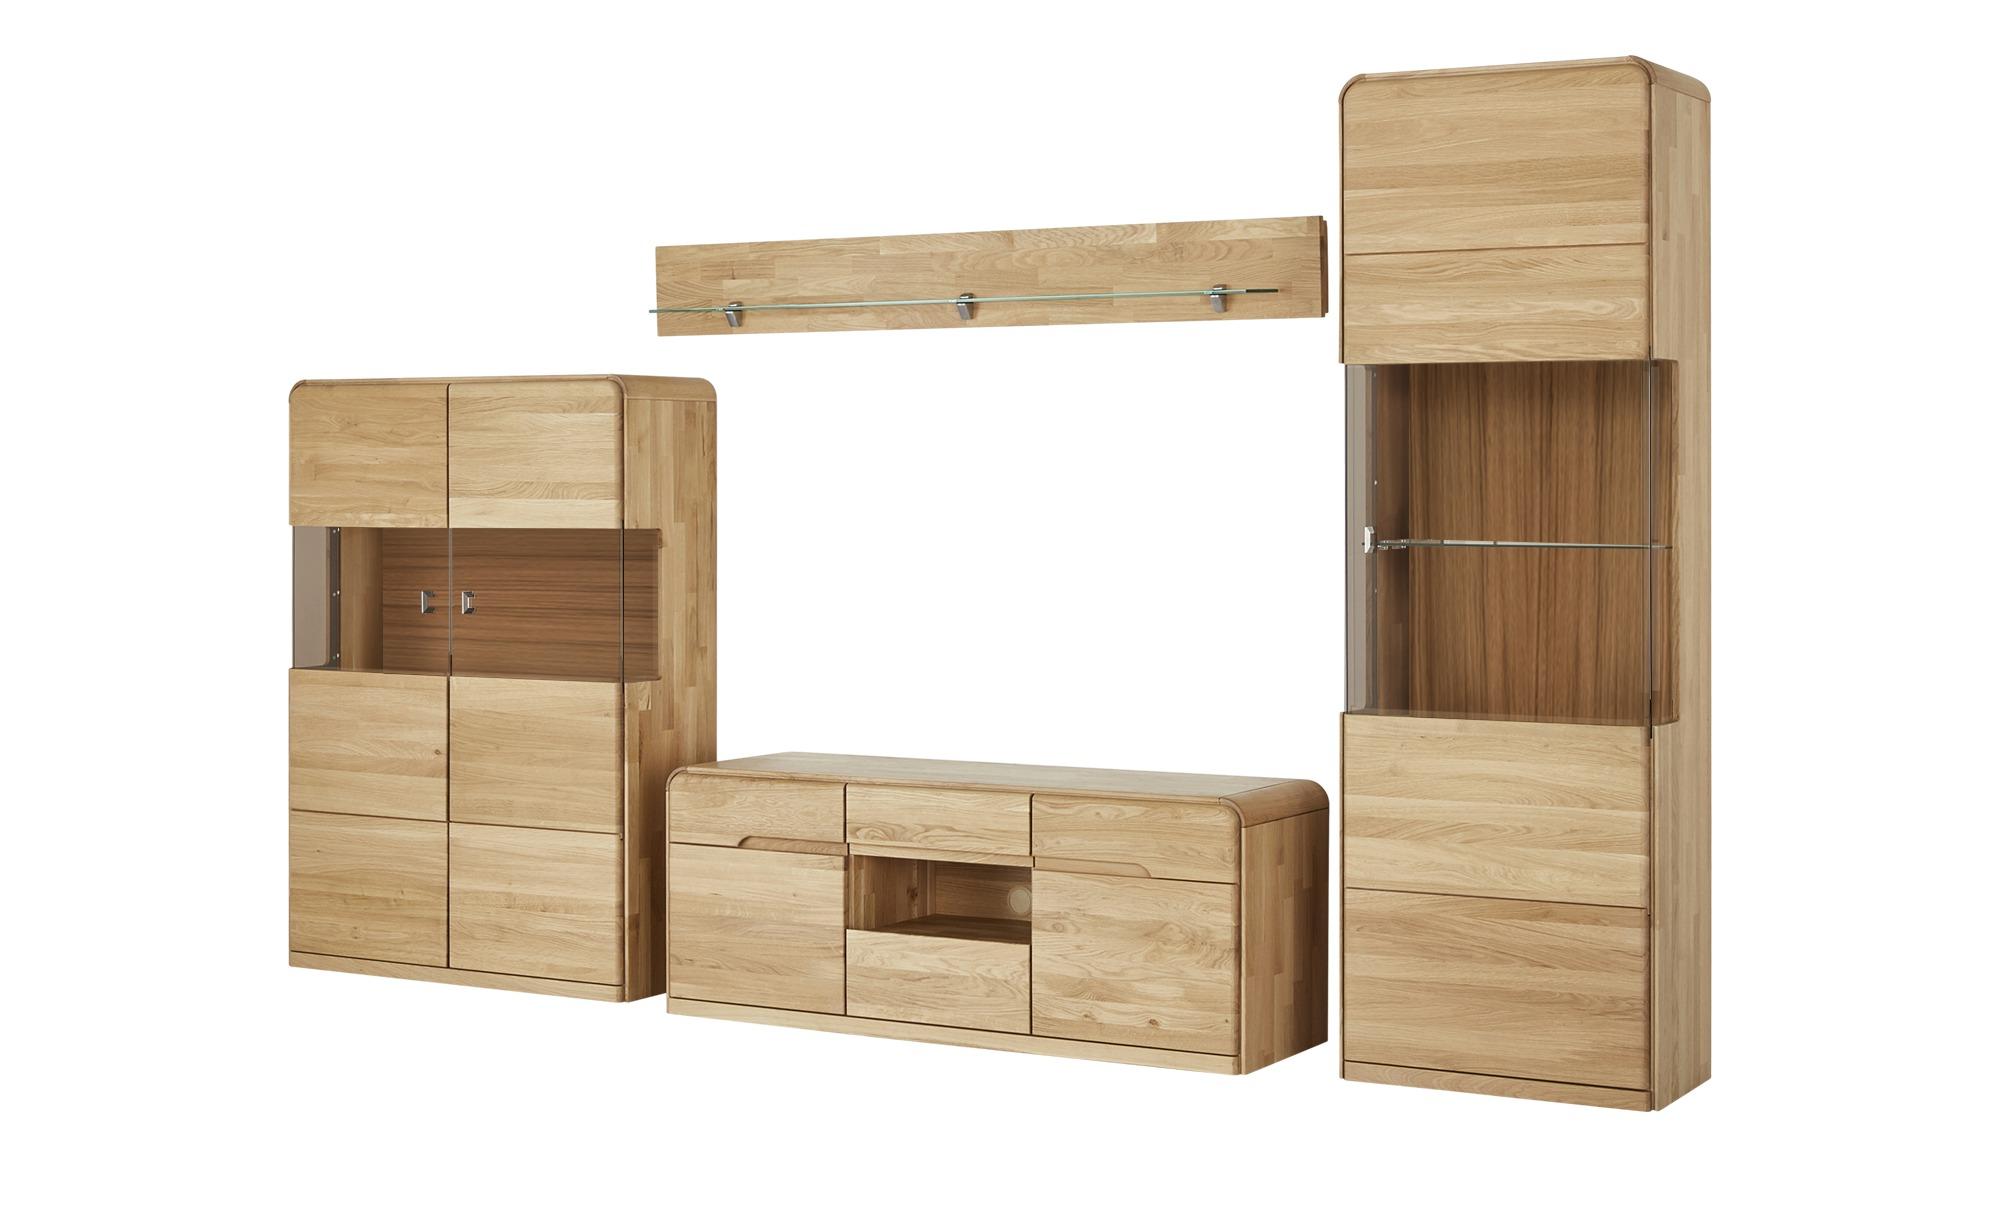 Woodford Wohnwand Merano Holzfarben Maße Cm B 317 H 204 T